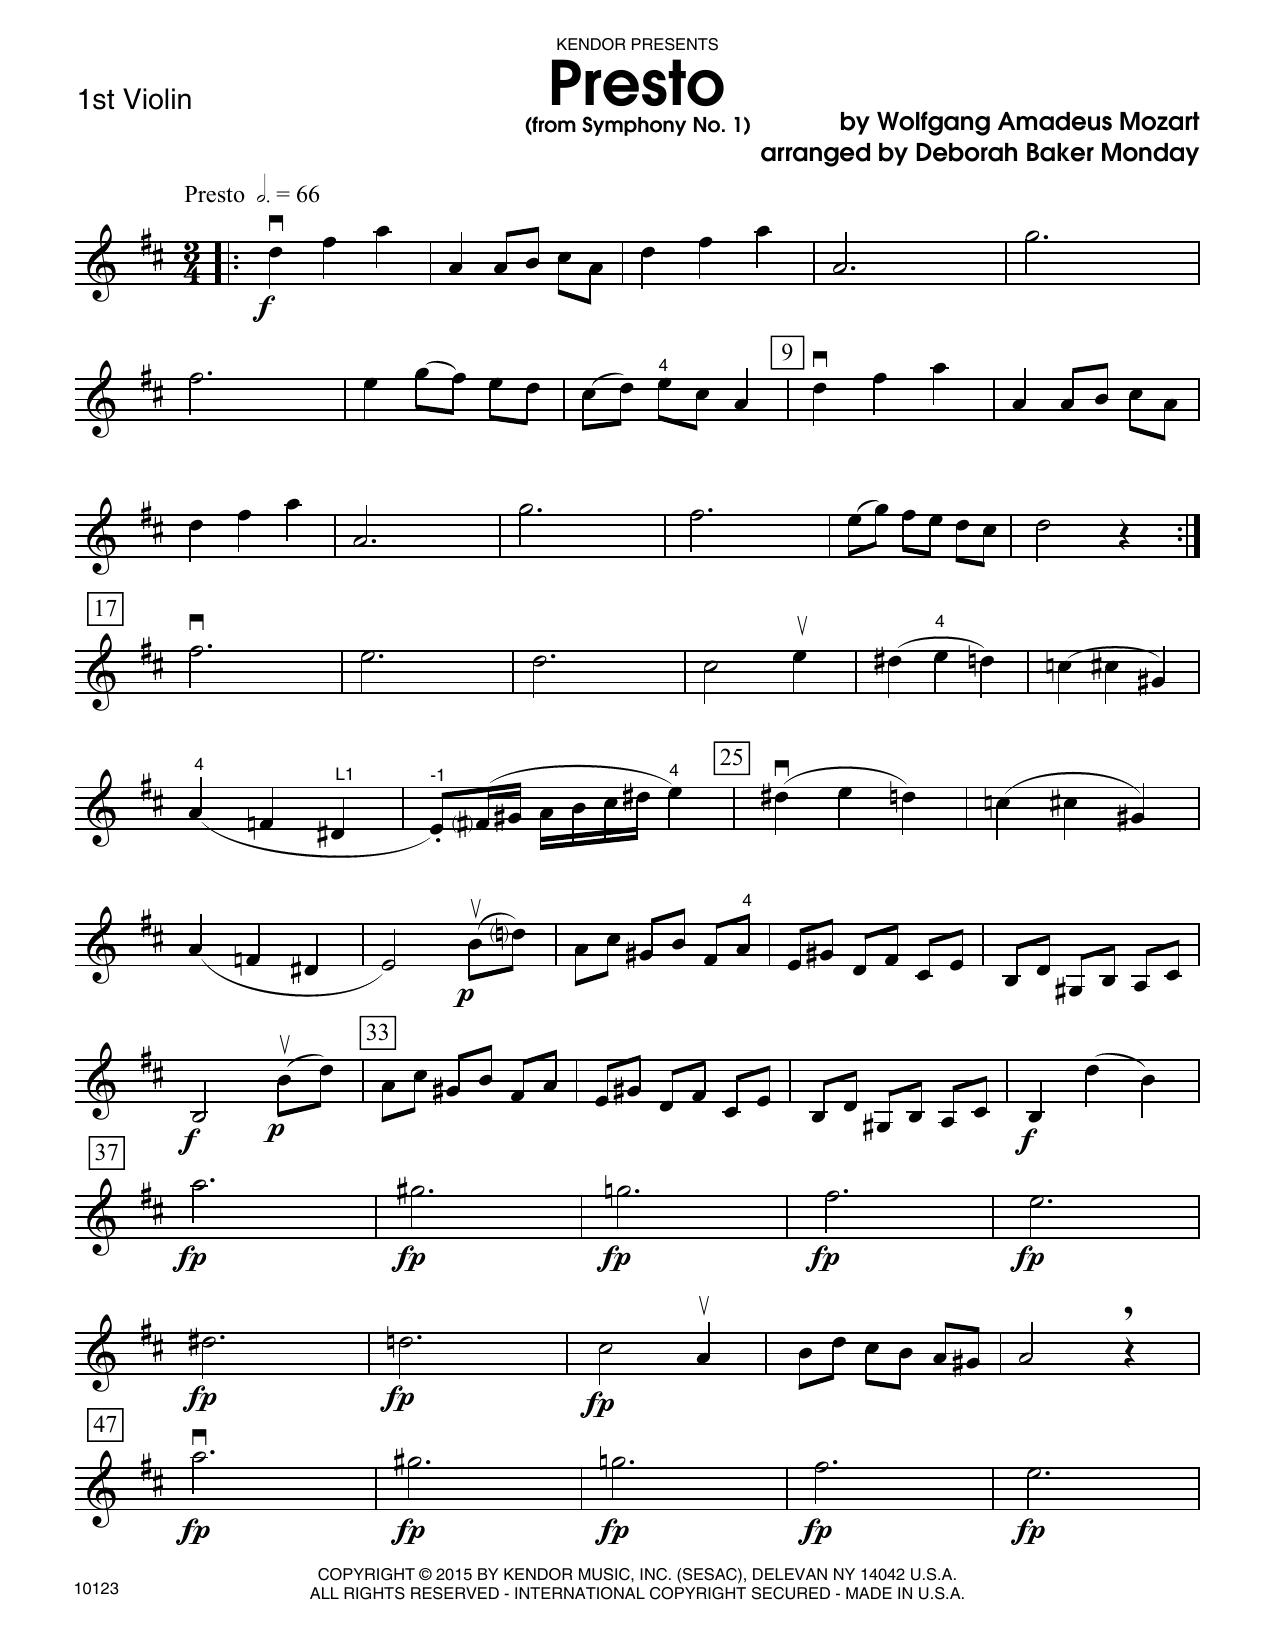 Mozart - Presto (from Symphony No. 1) - 1st Violin